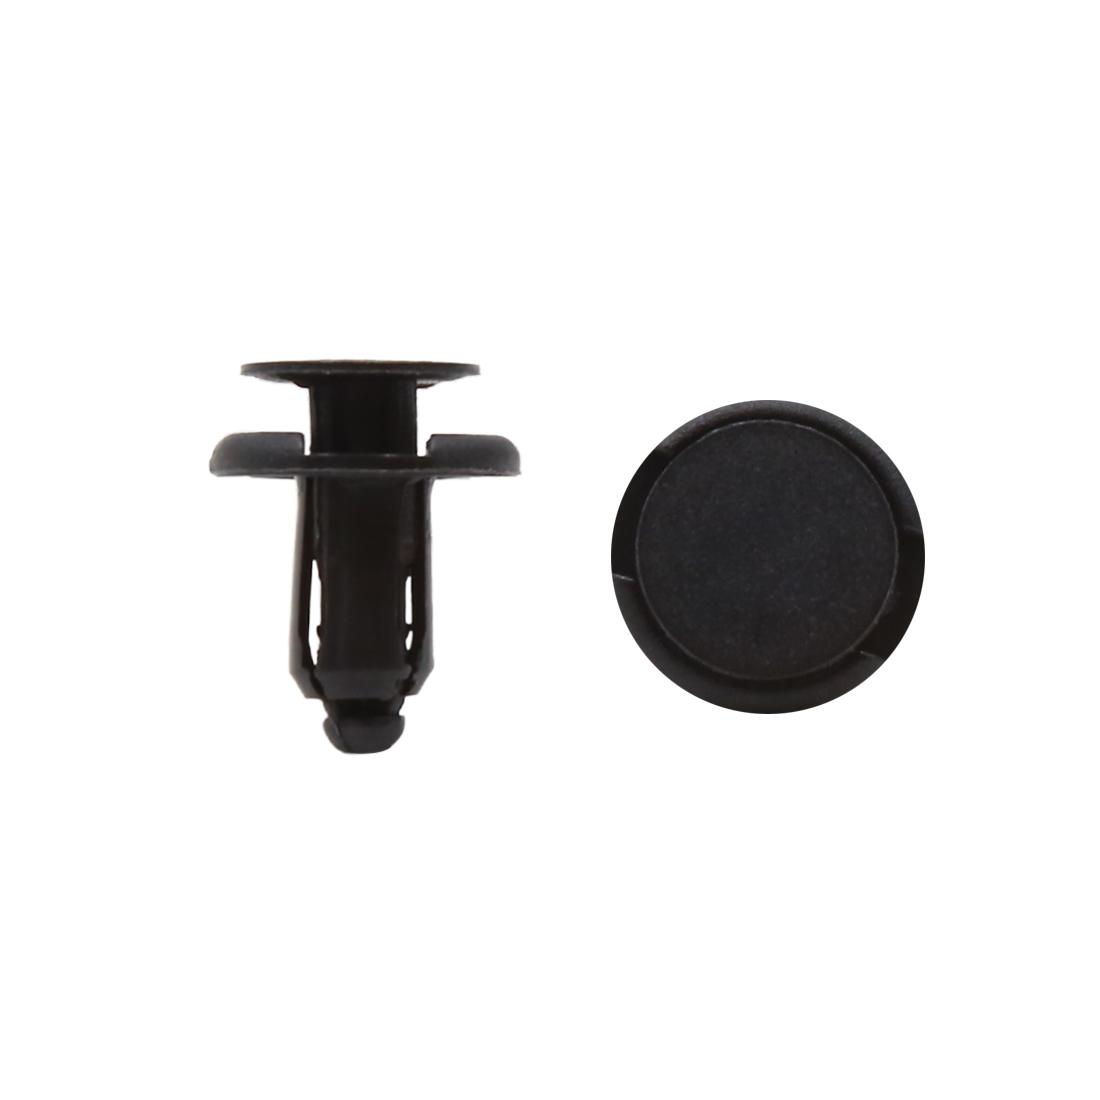 100pcs 8mm Hole 17.5mm Head Plastic Rivets Fastener Push Clips Black for Car